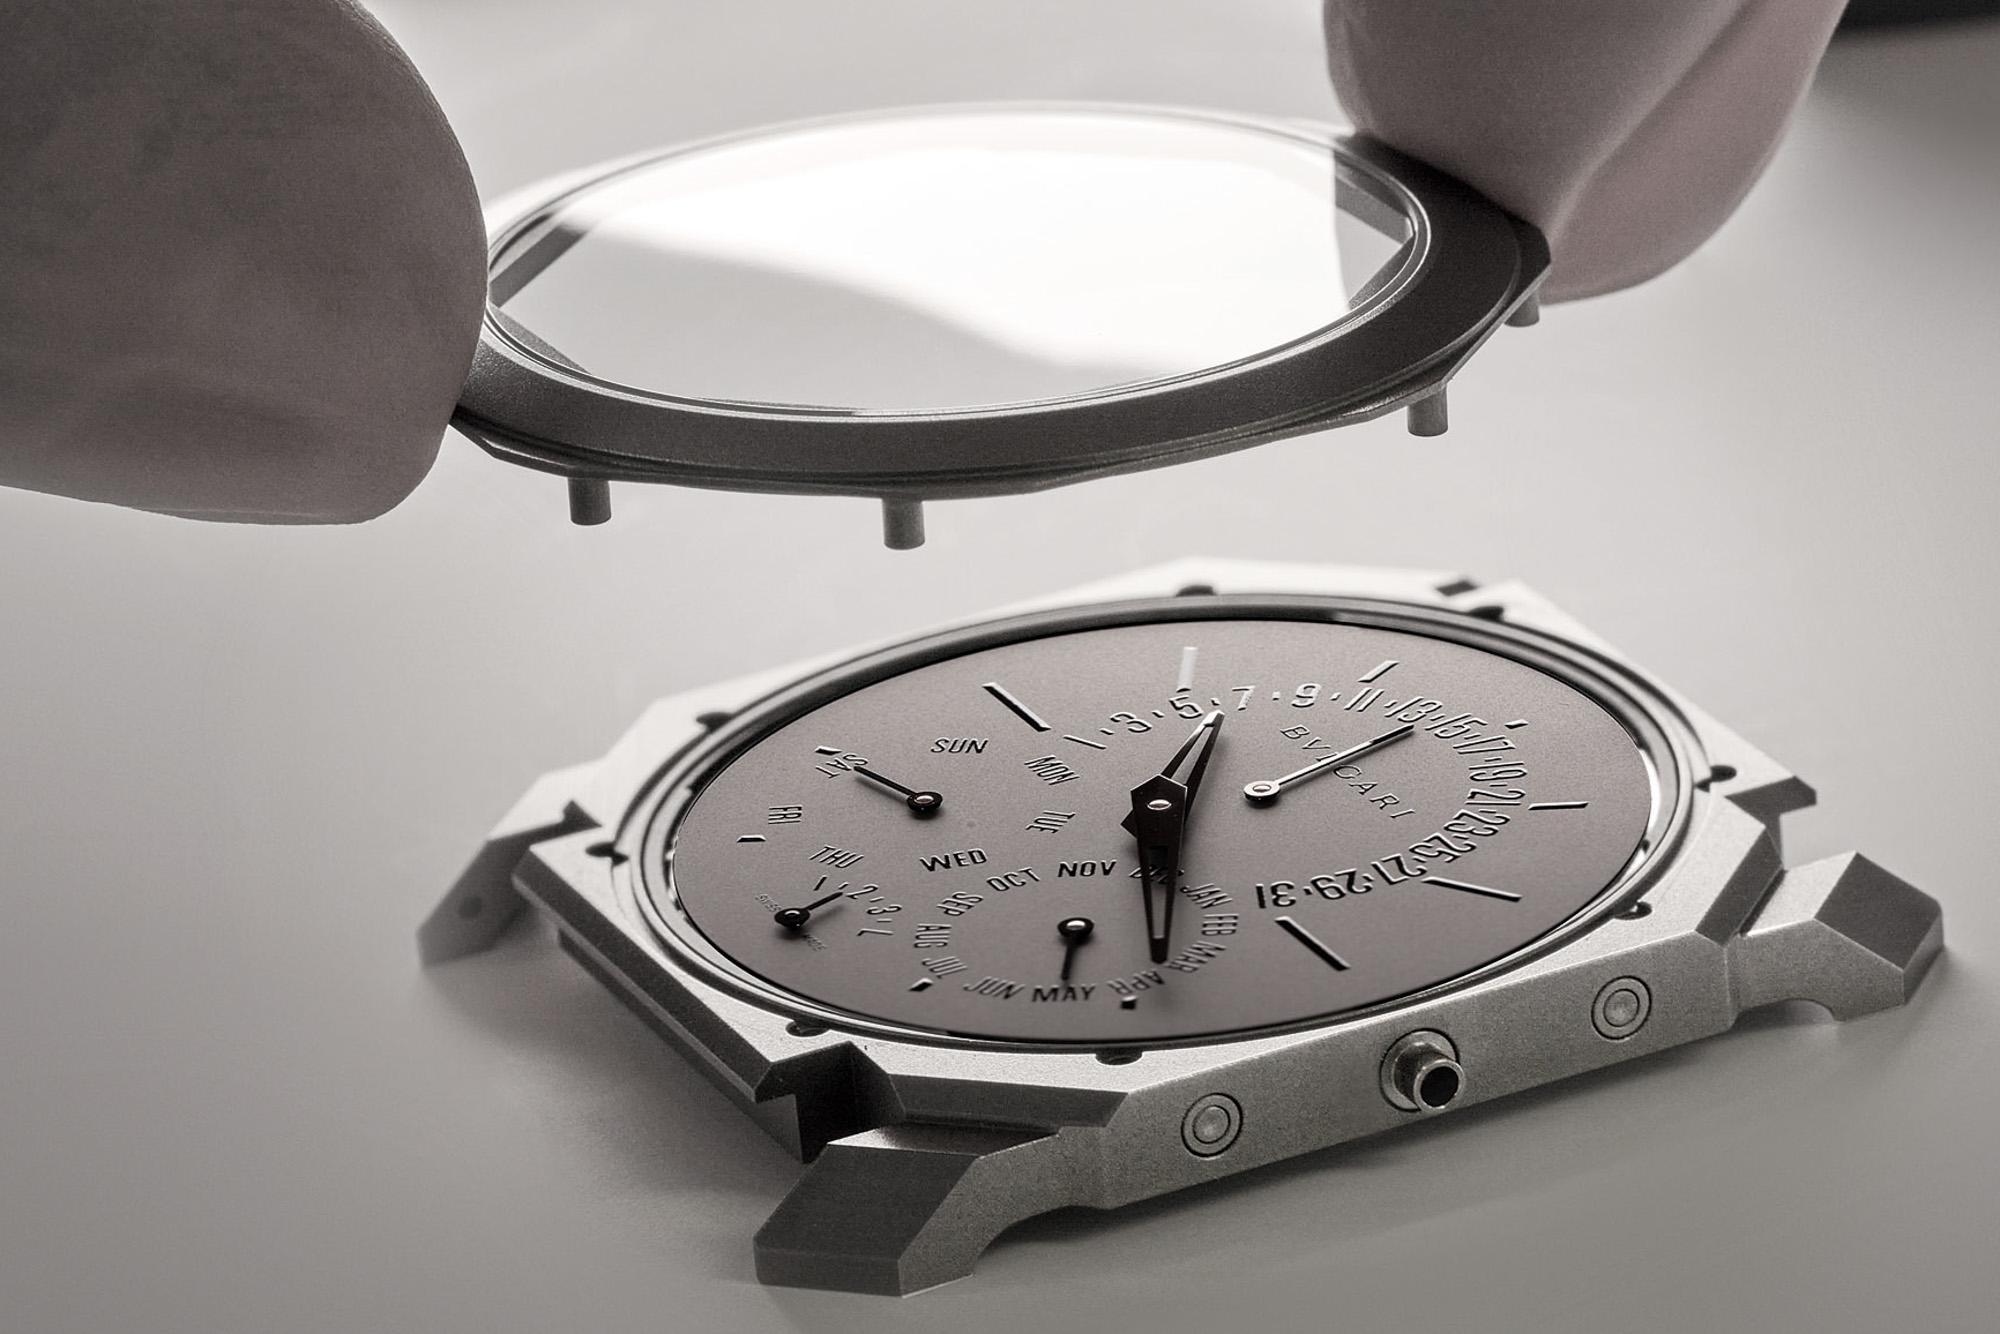 Bulgari Octo Finissimo Perpetual Calendar Watch–Ultra Thin World Record Dress Watch 2021 20